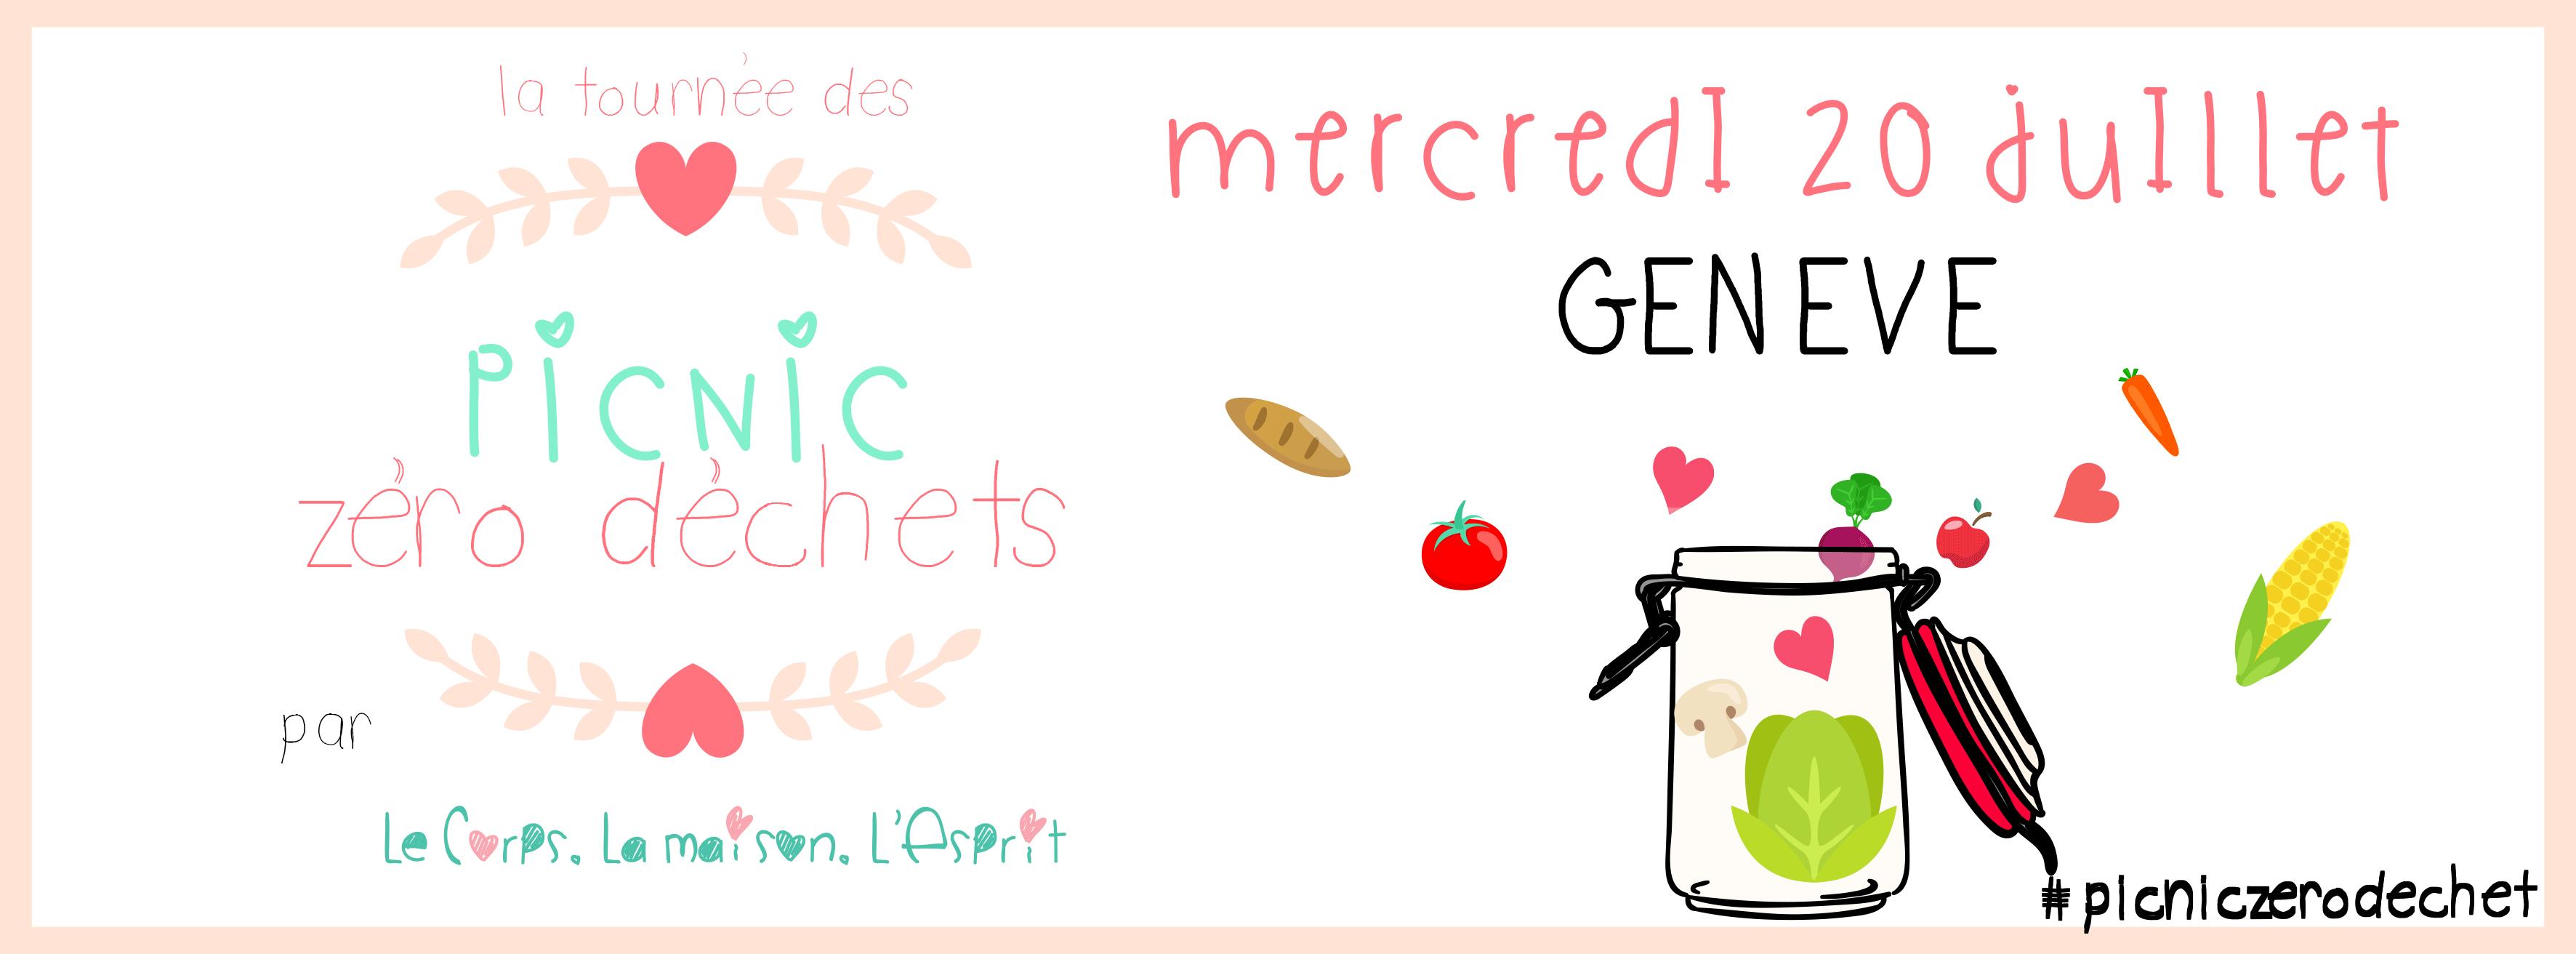 PIC-NIC-GENEVE